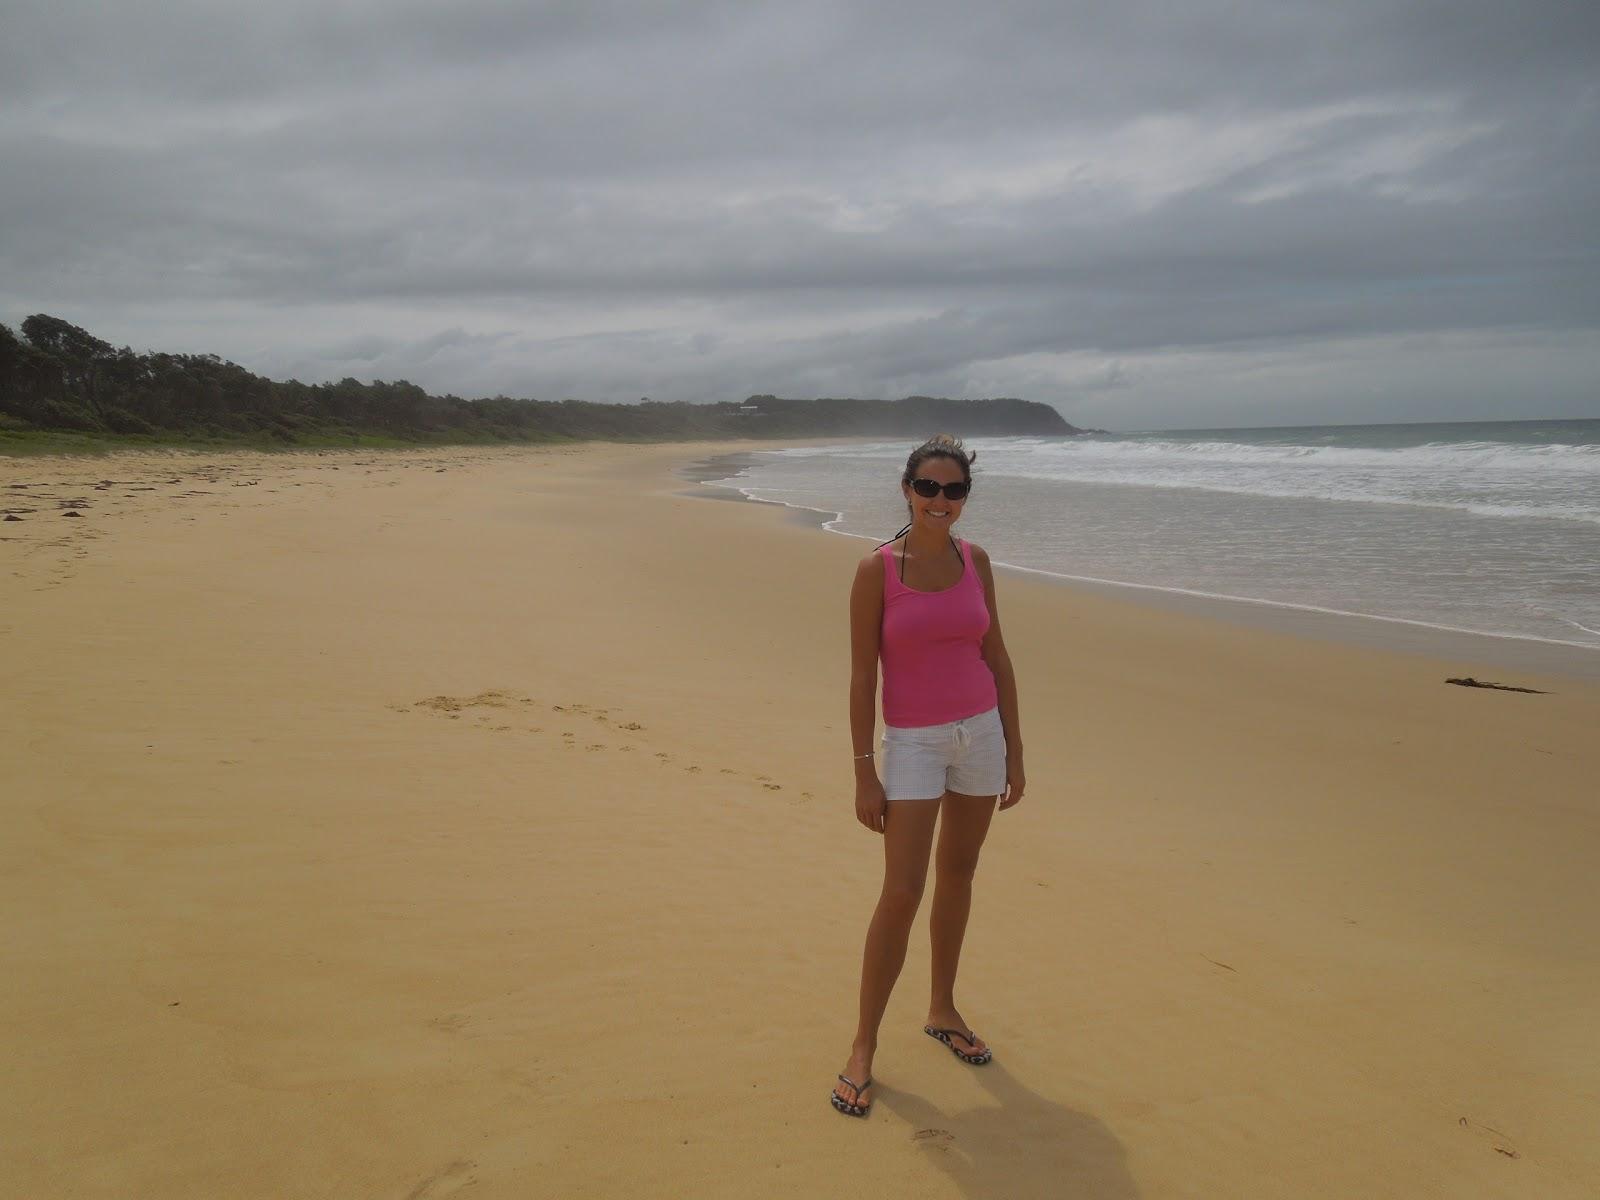 Nudist beach nsw south coast